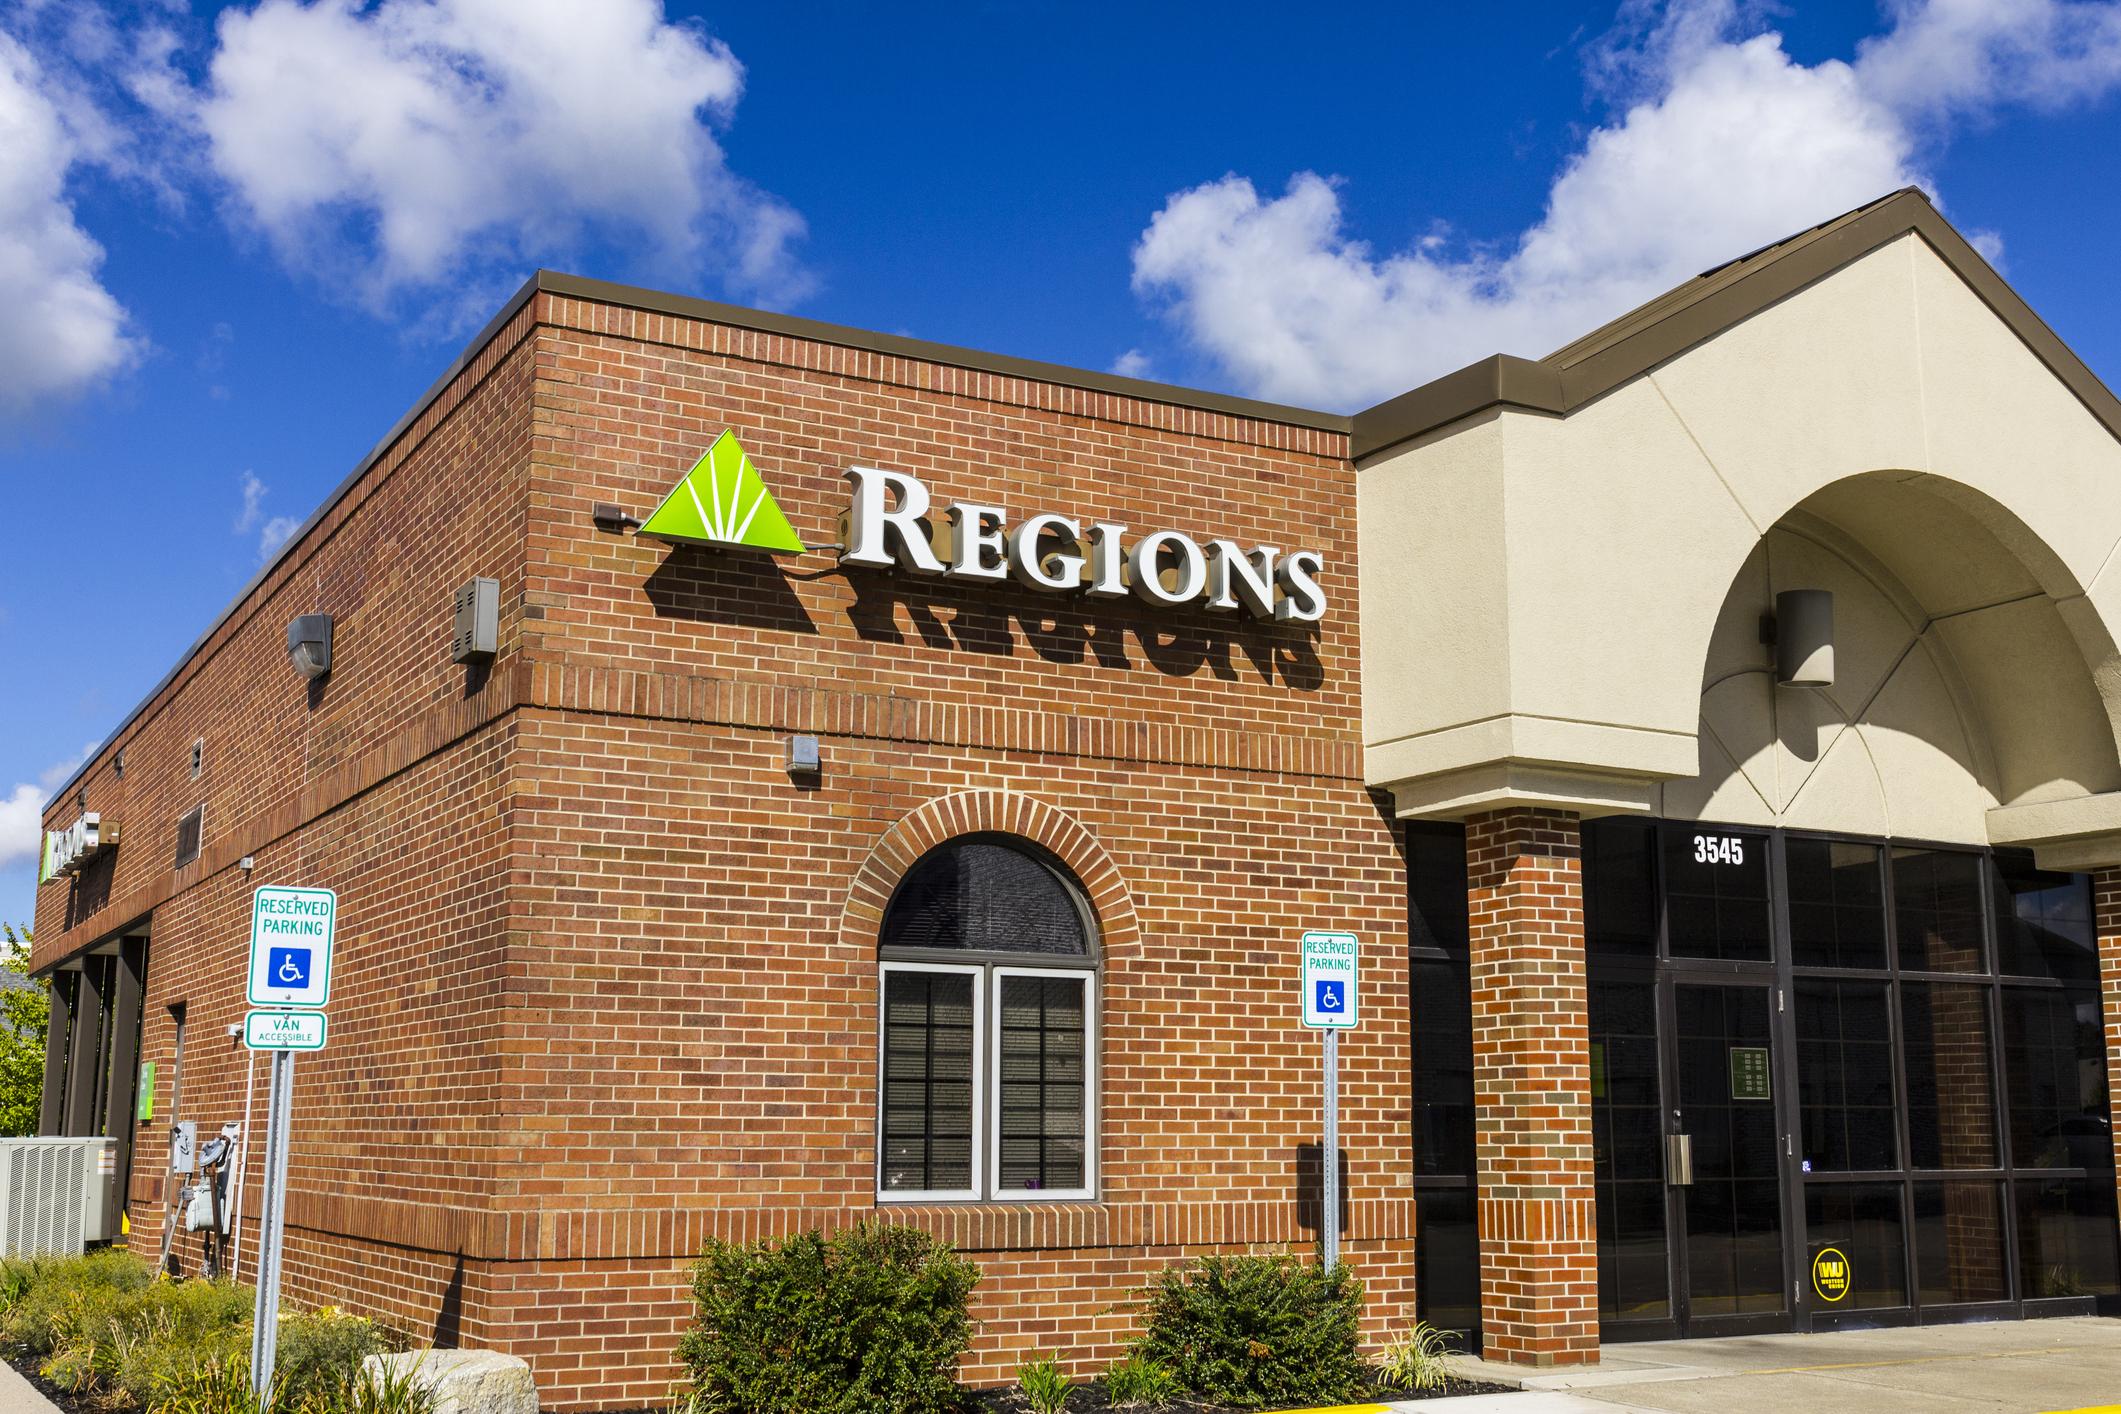 Regions Bank branch